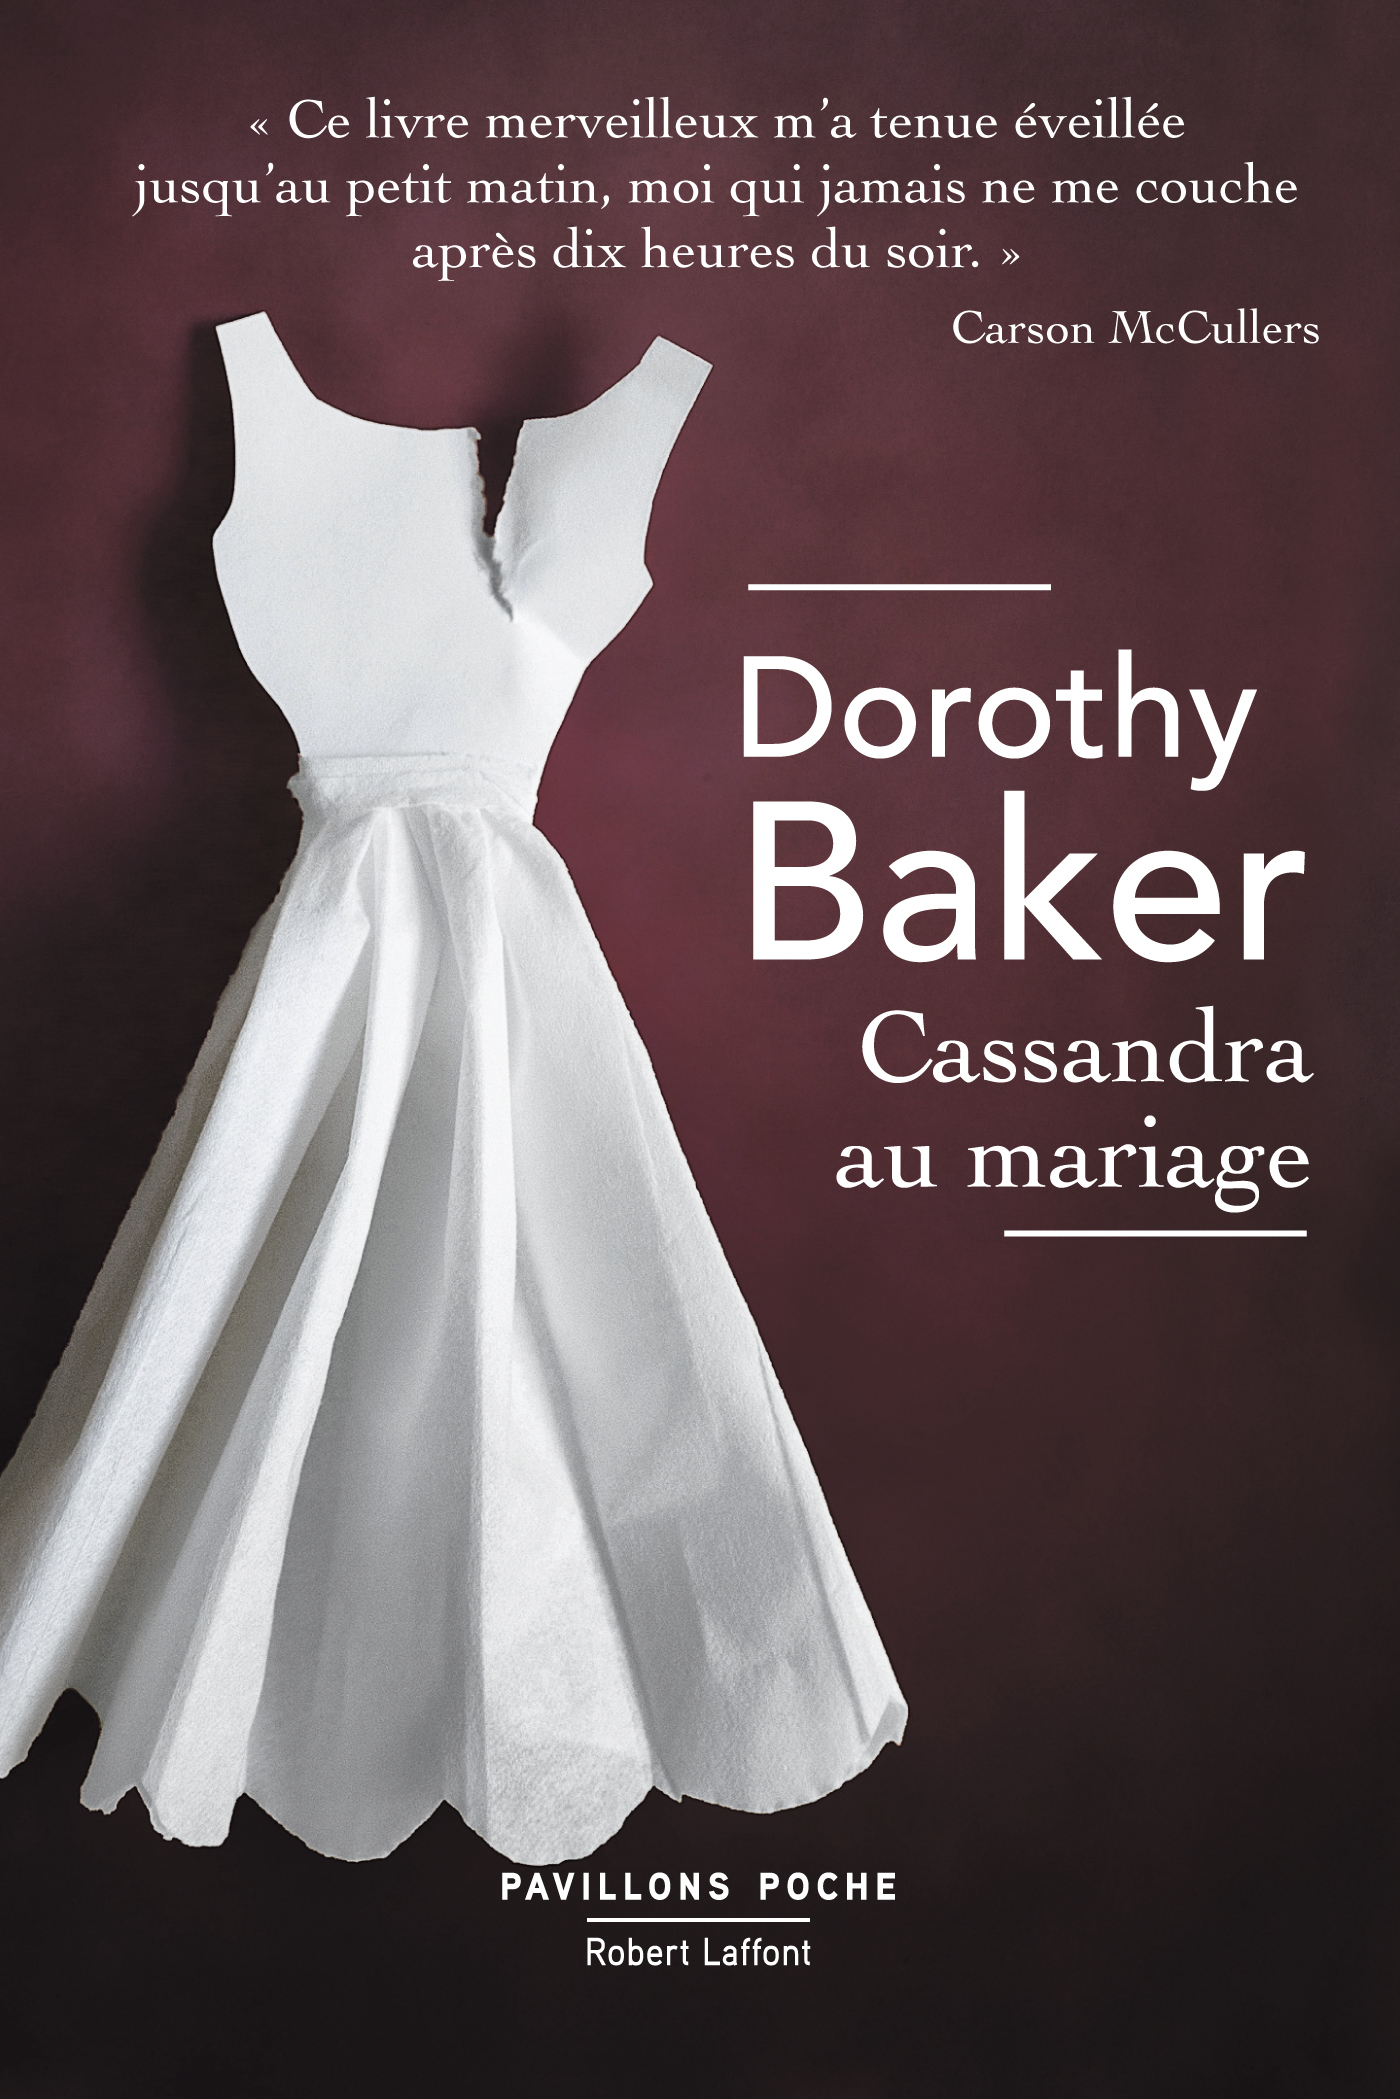 Cassandra au mariage